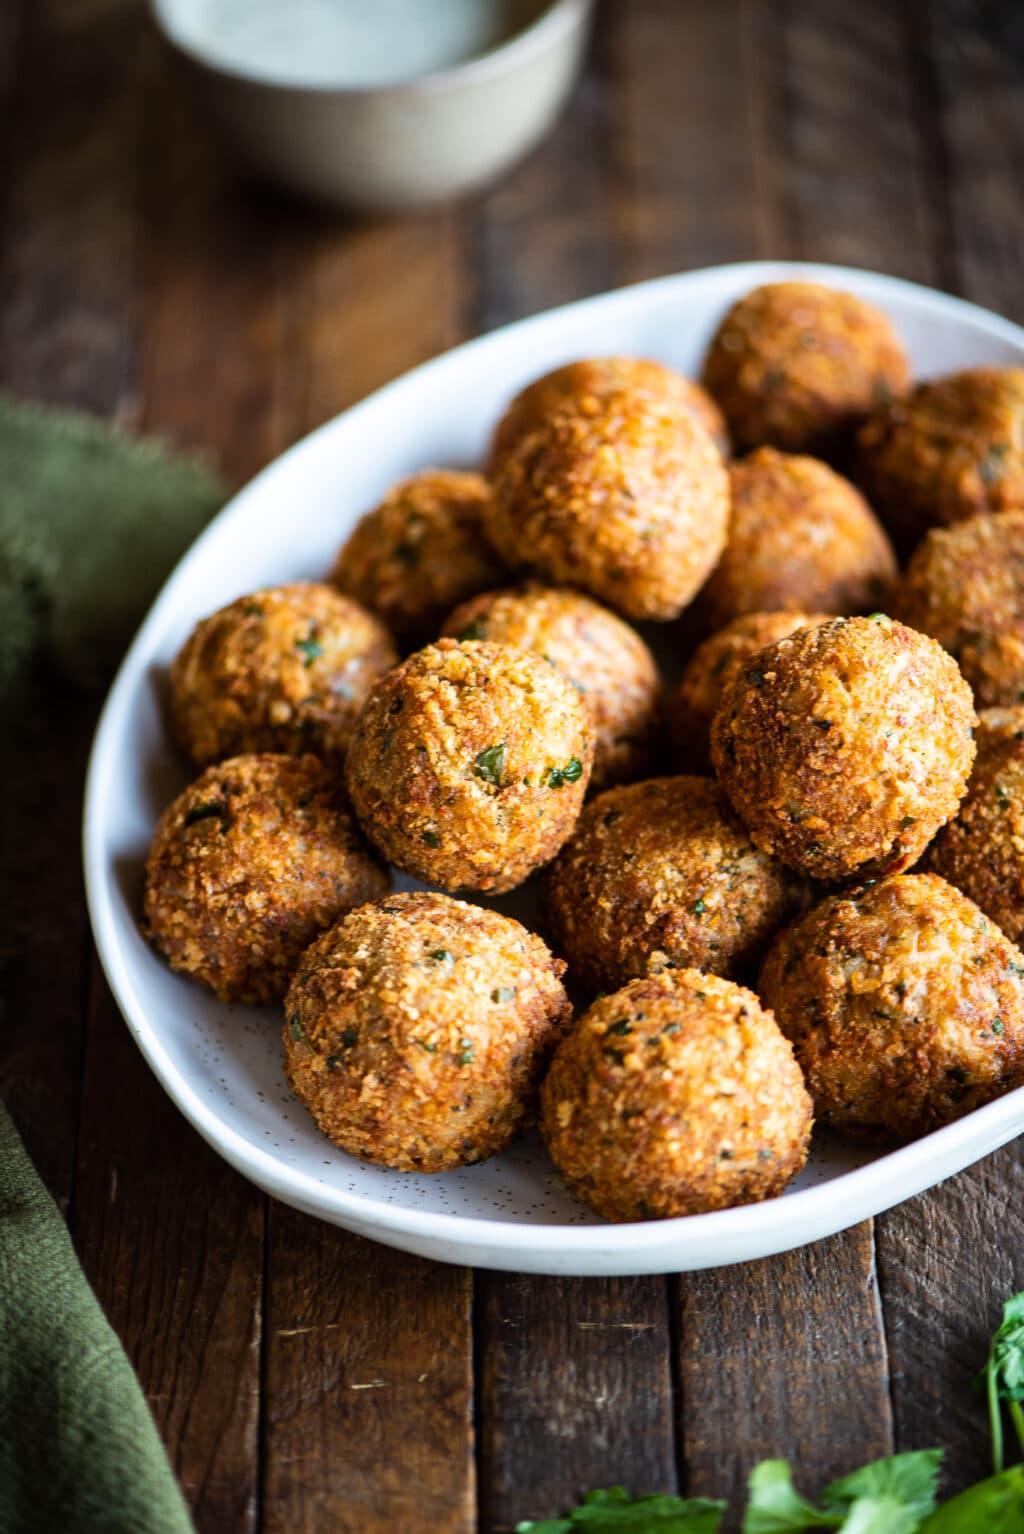 arancini Sicilian rice balls